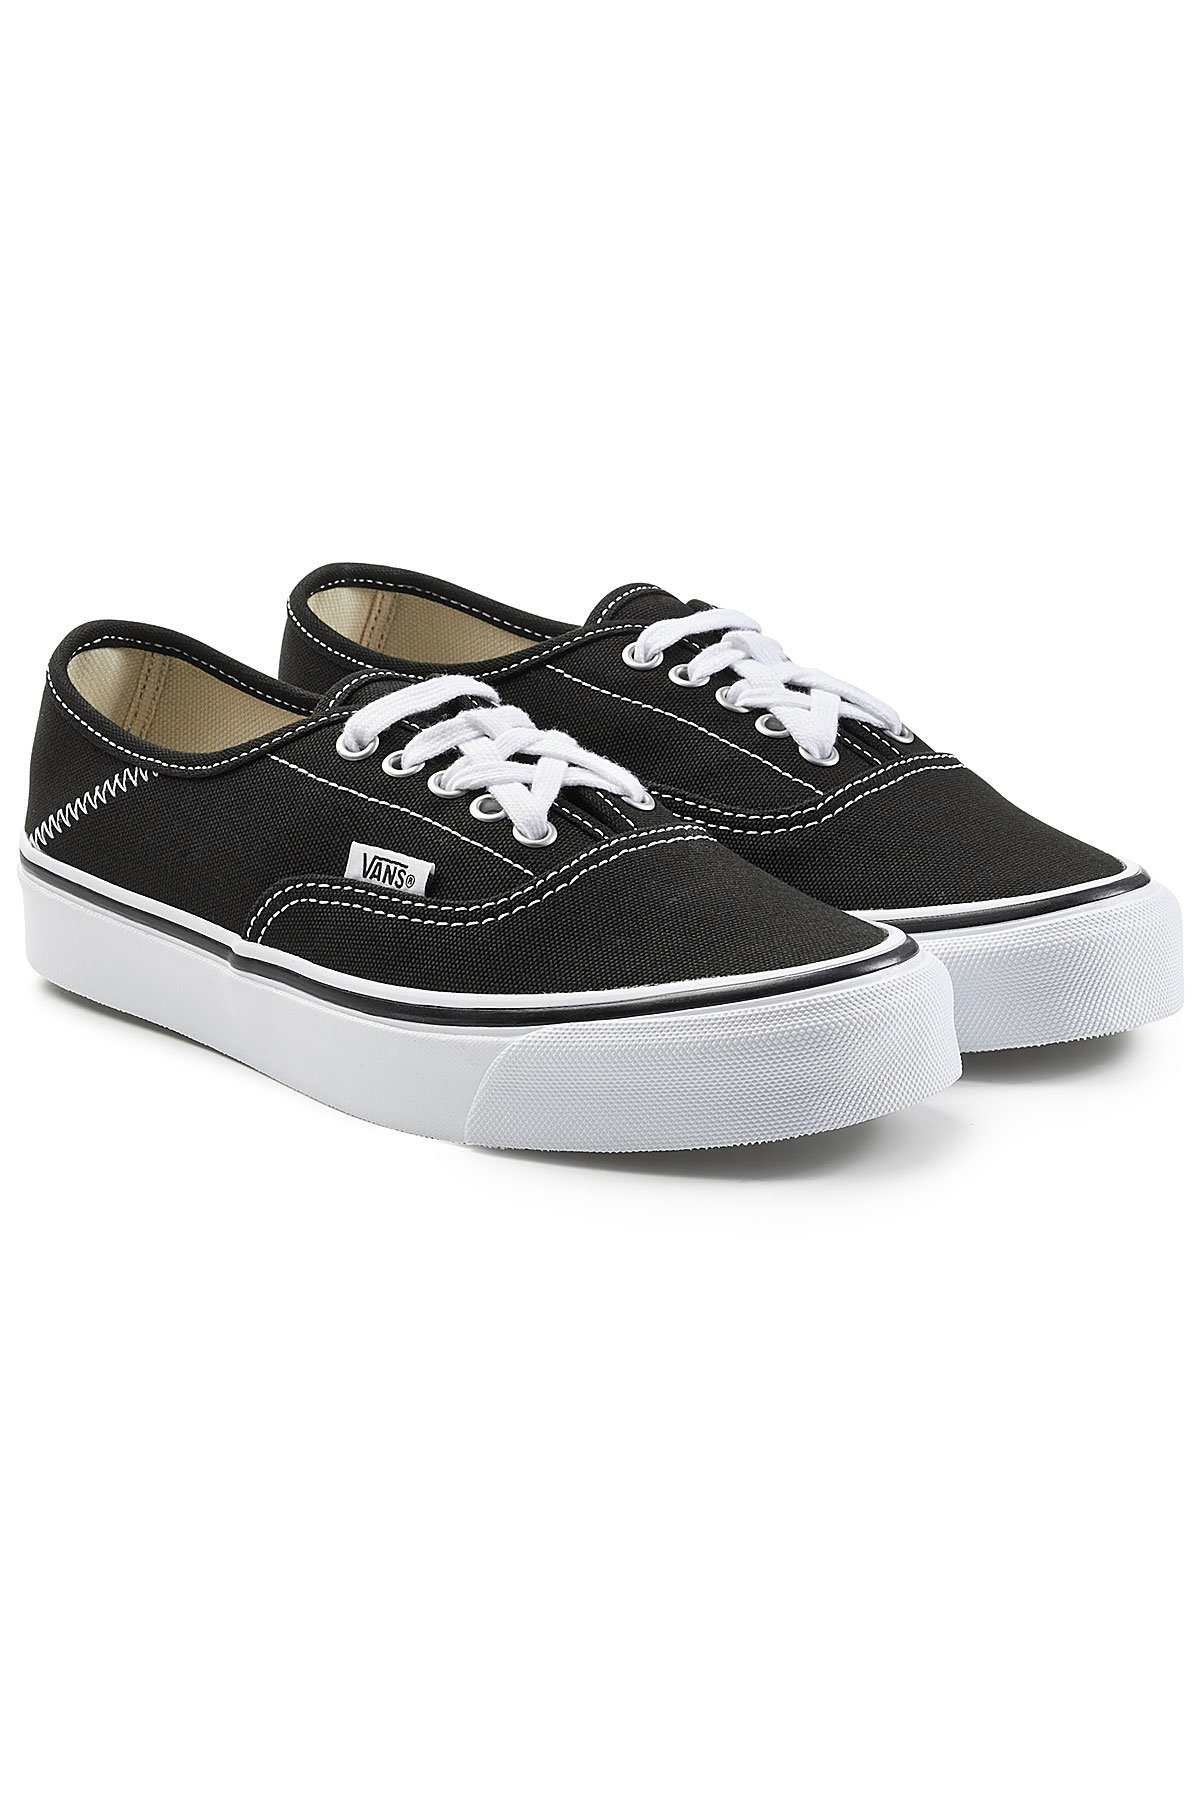 Vans Authentic Sneakers Gr. US 7